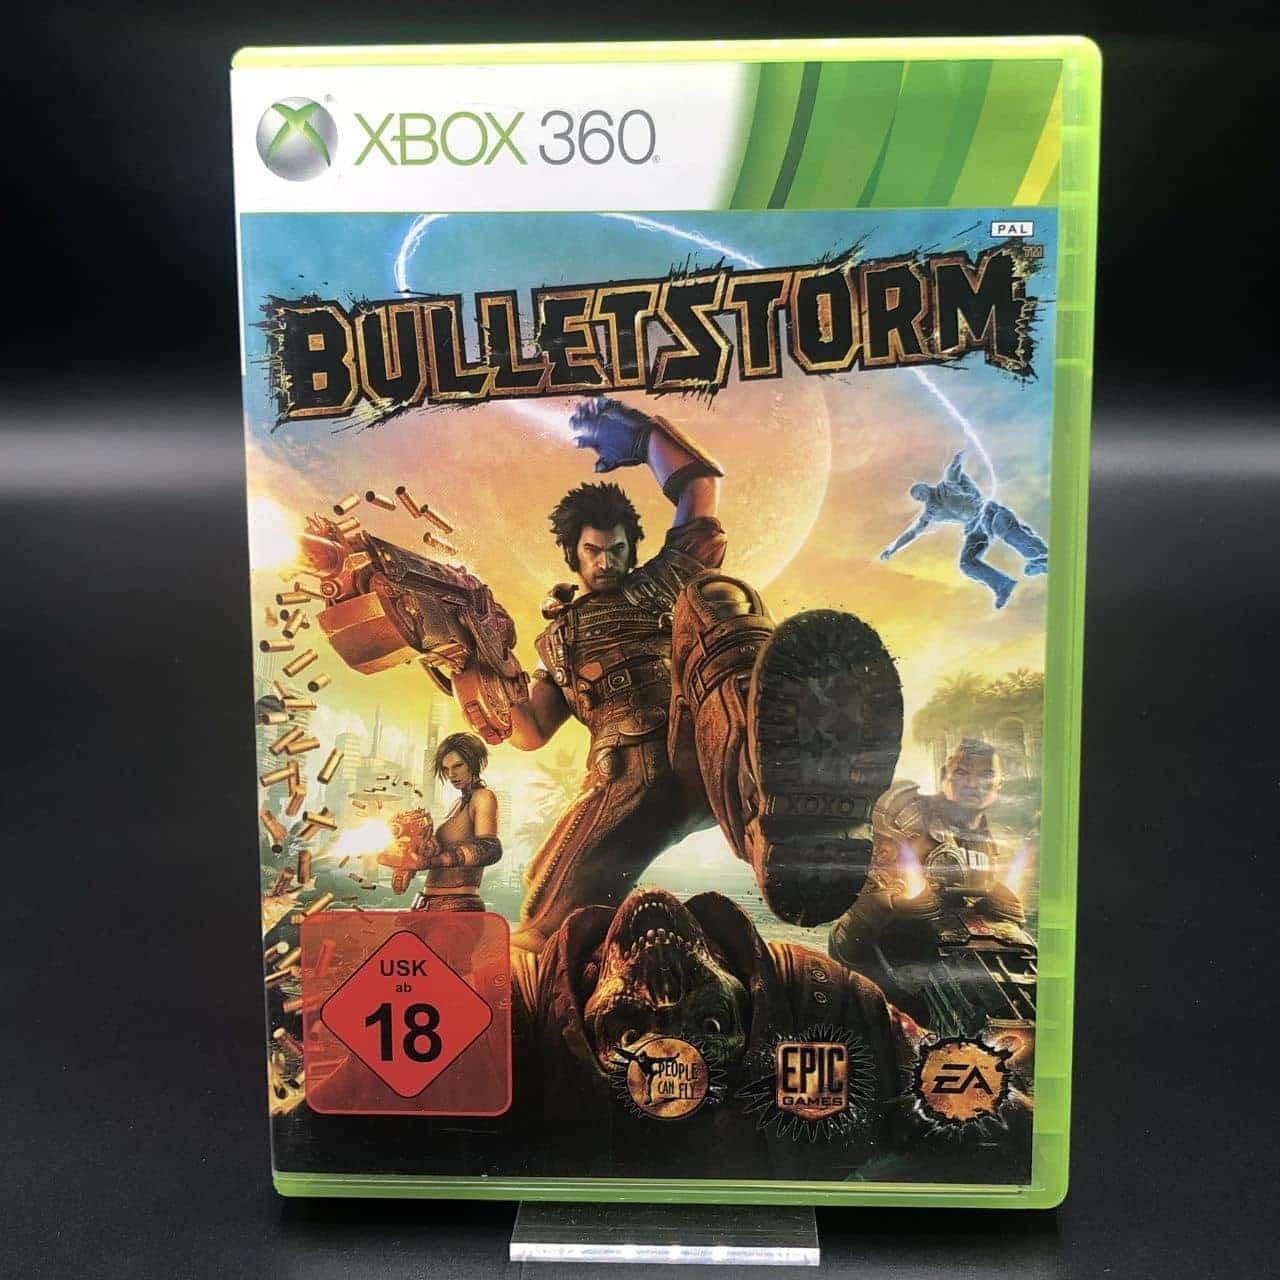 Bulletstorm (Komplett) (Sehr gut) XBOX 360 (FSK18)